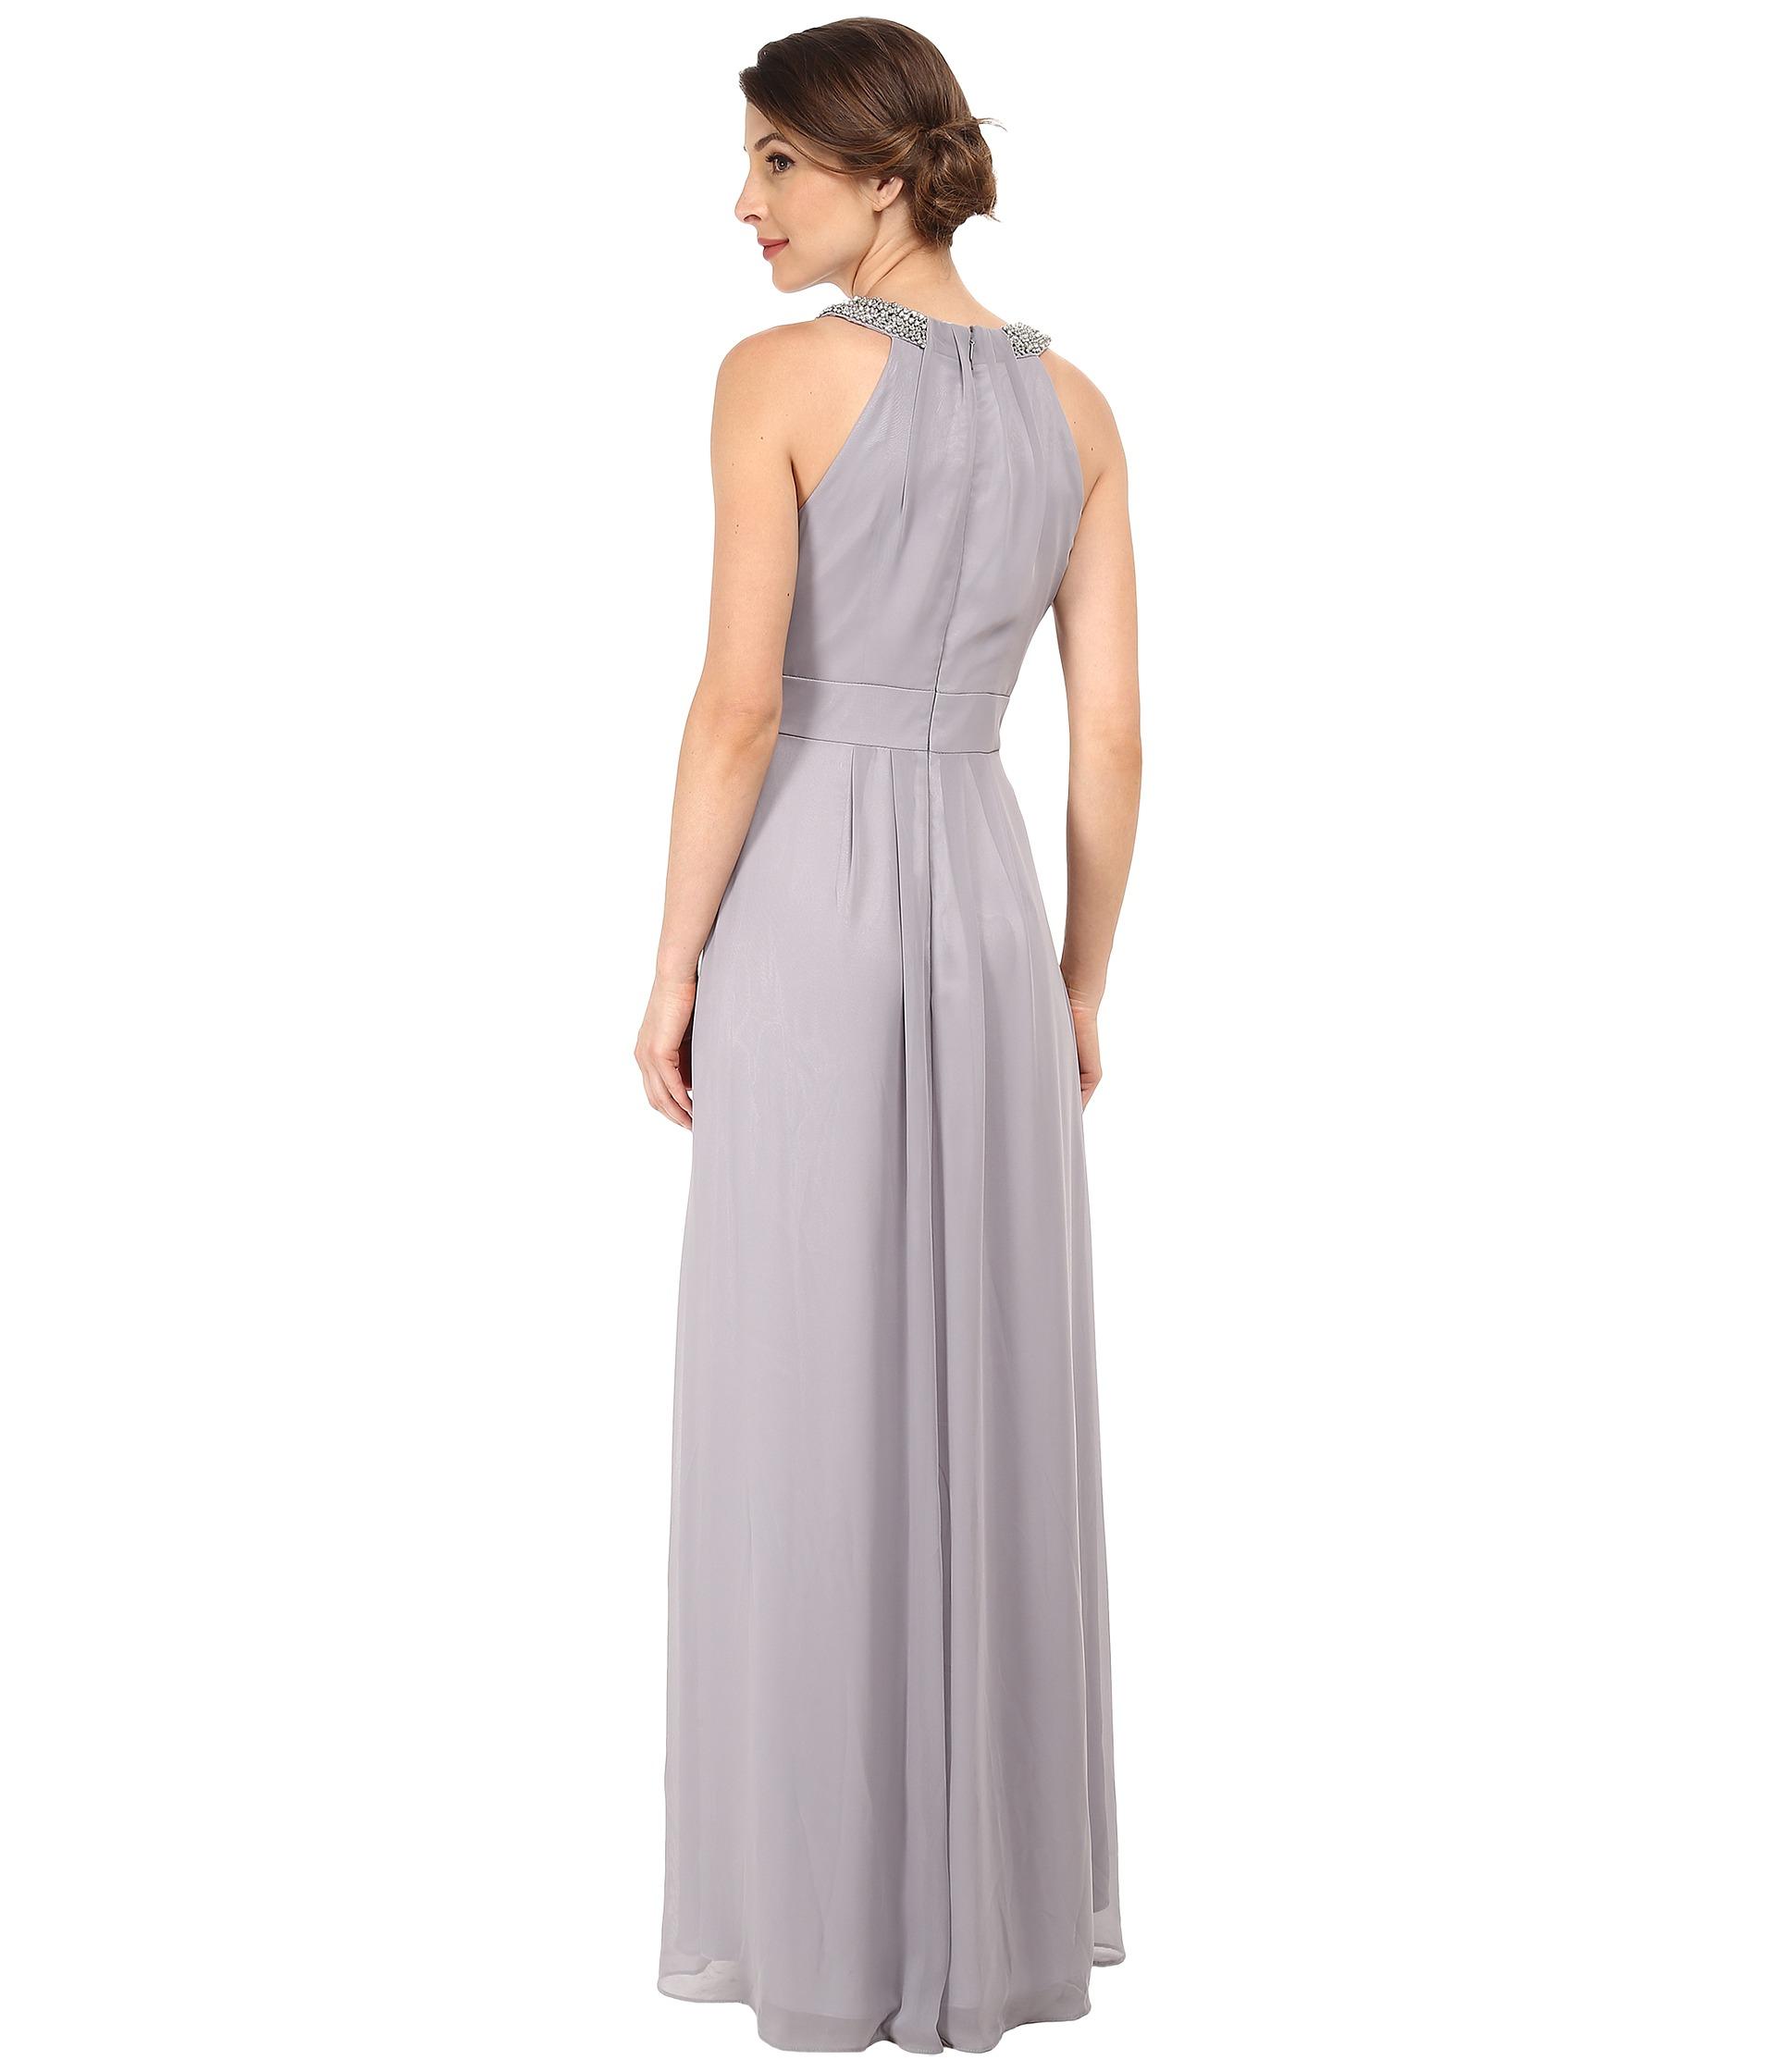 eff350858776 Eliza J Chiffon Gown With Beaded Neckband in Metallic - Lyst